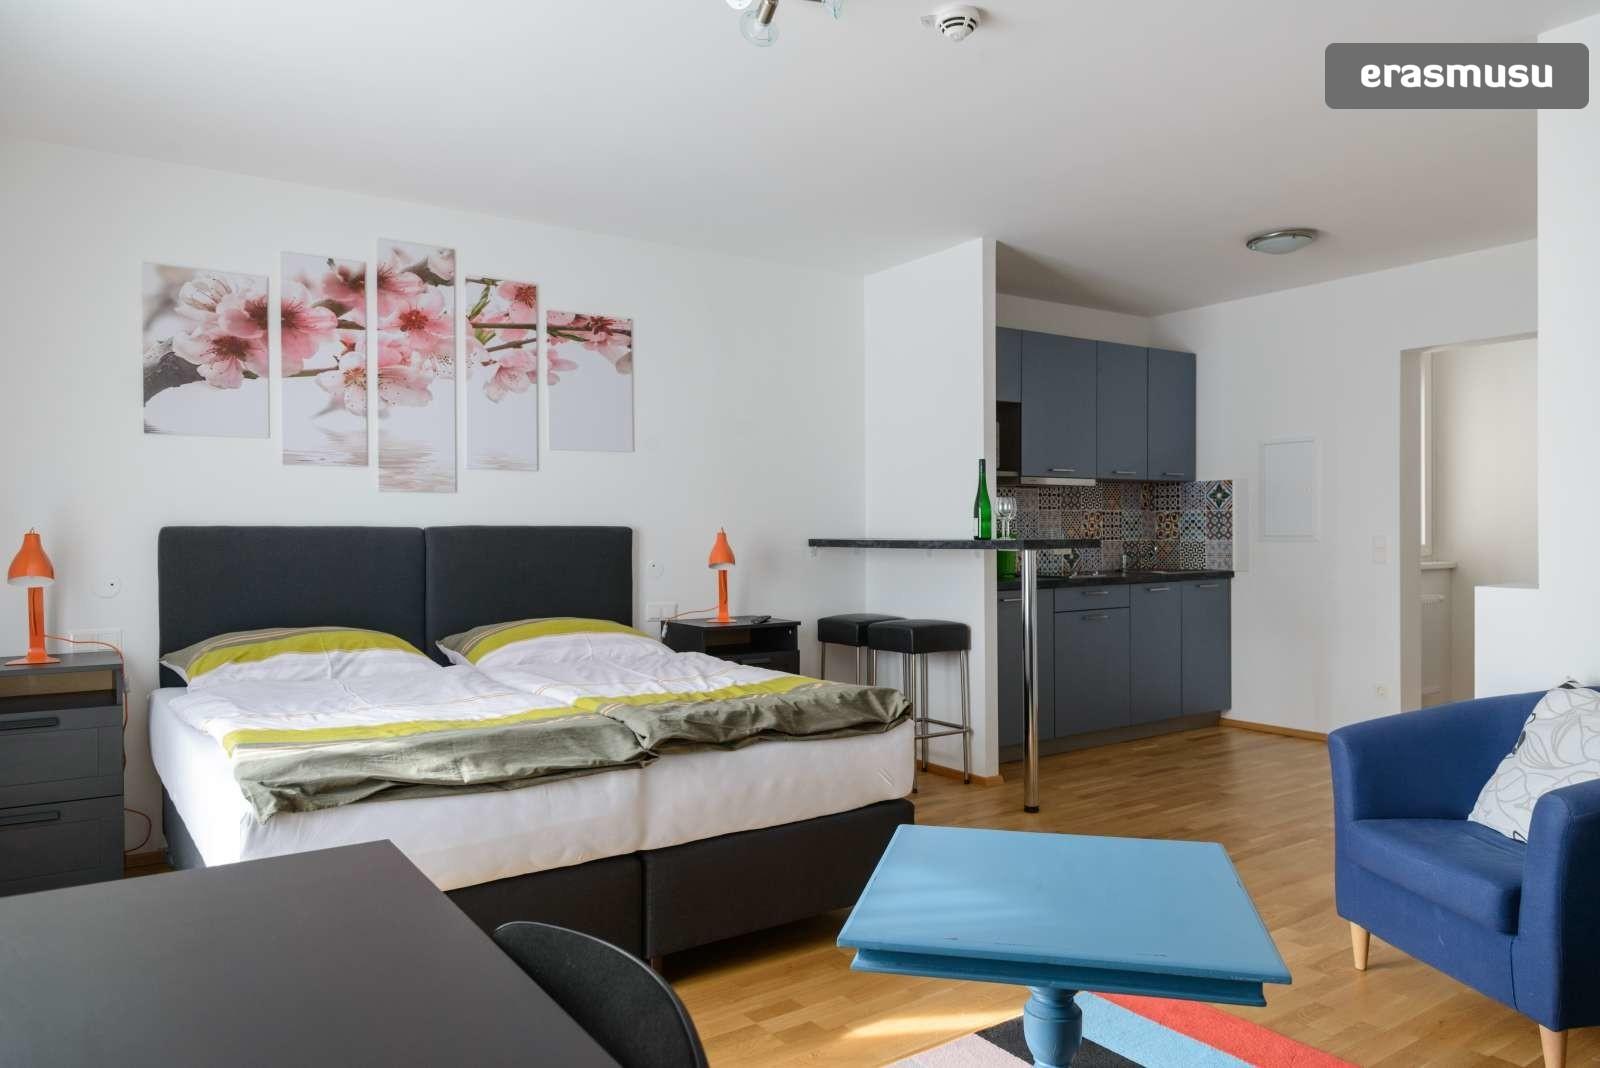 spacious-studio-apartment-rent-aspern-area-donaustadt-f84bb1fdb3